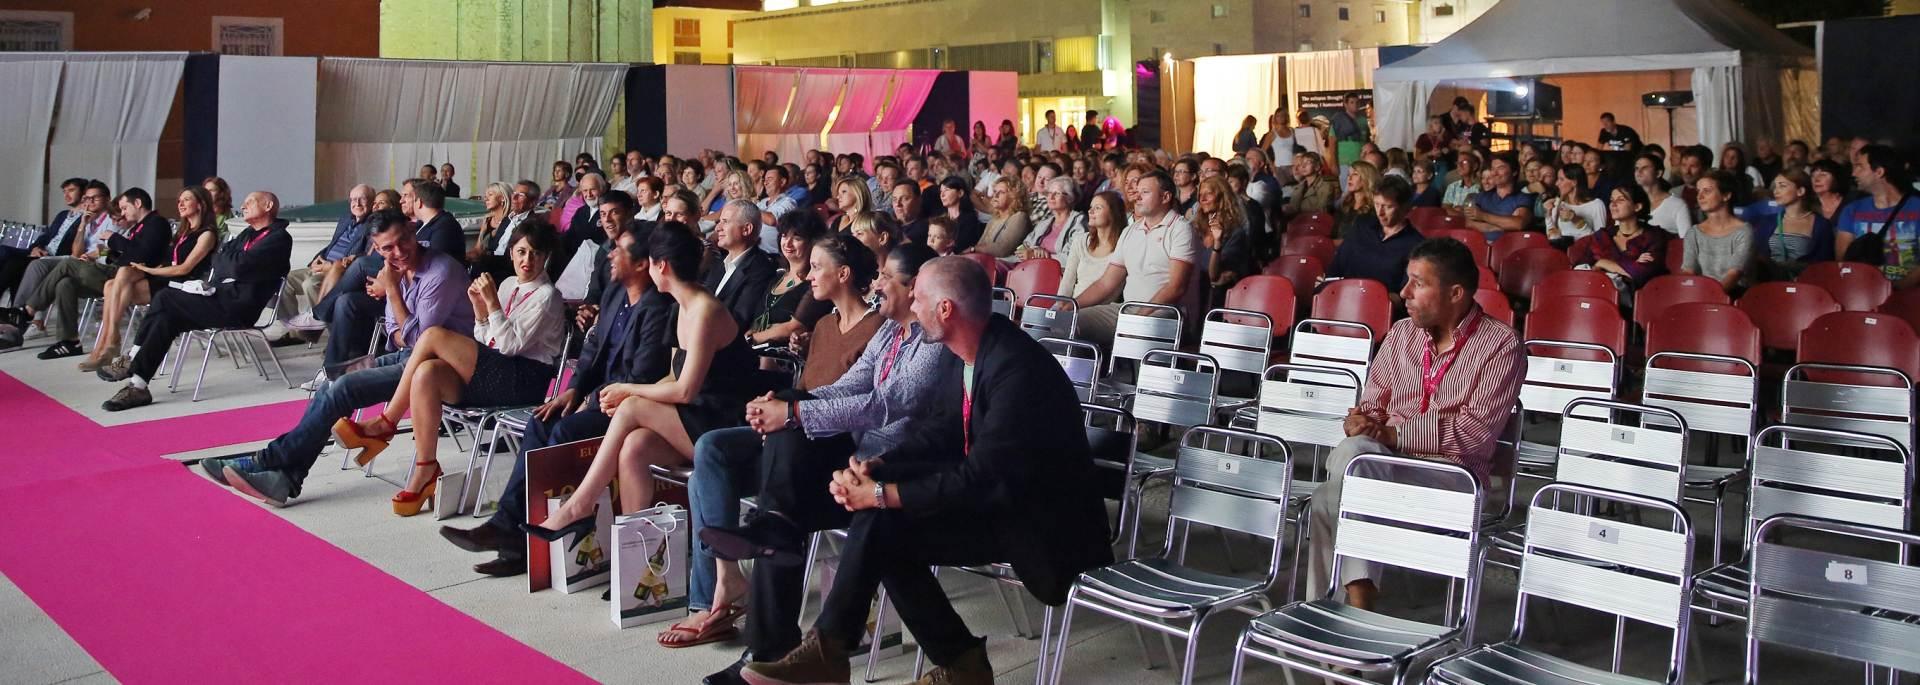 Selektor canneskoga festivala Christian Jeune gostovao na Avvantura Film Festivalu